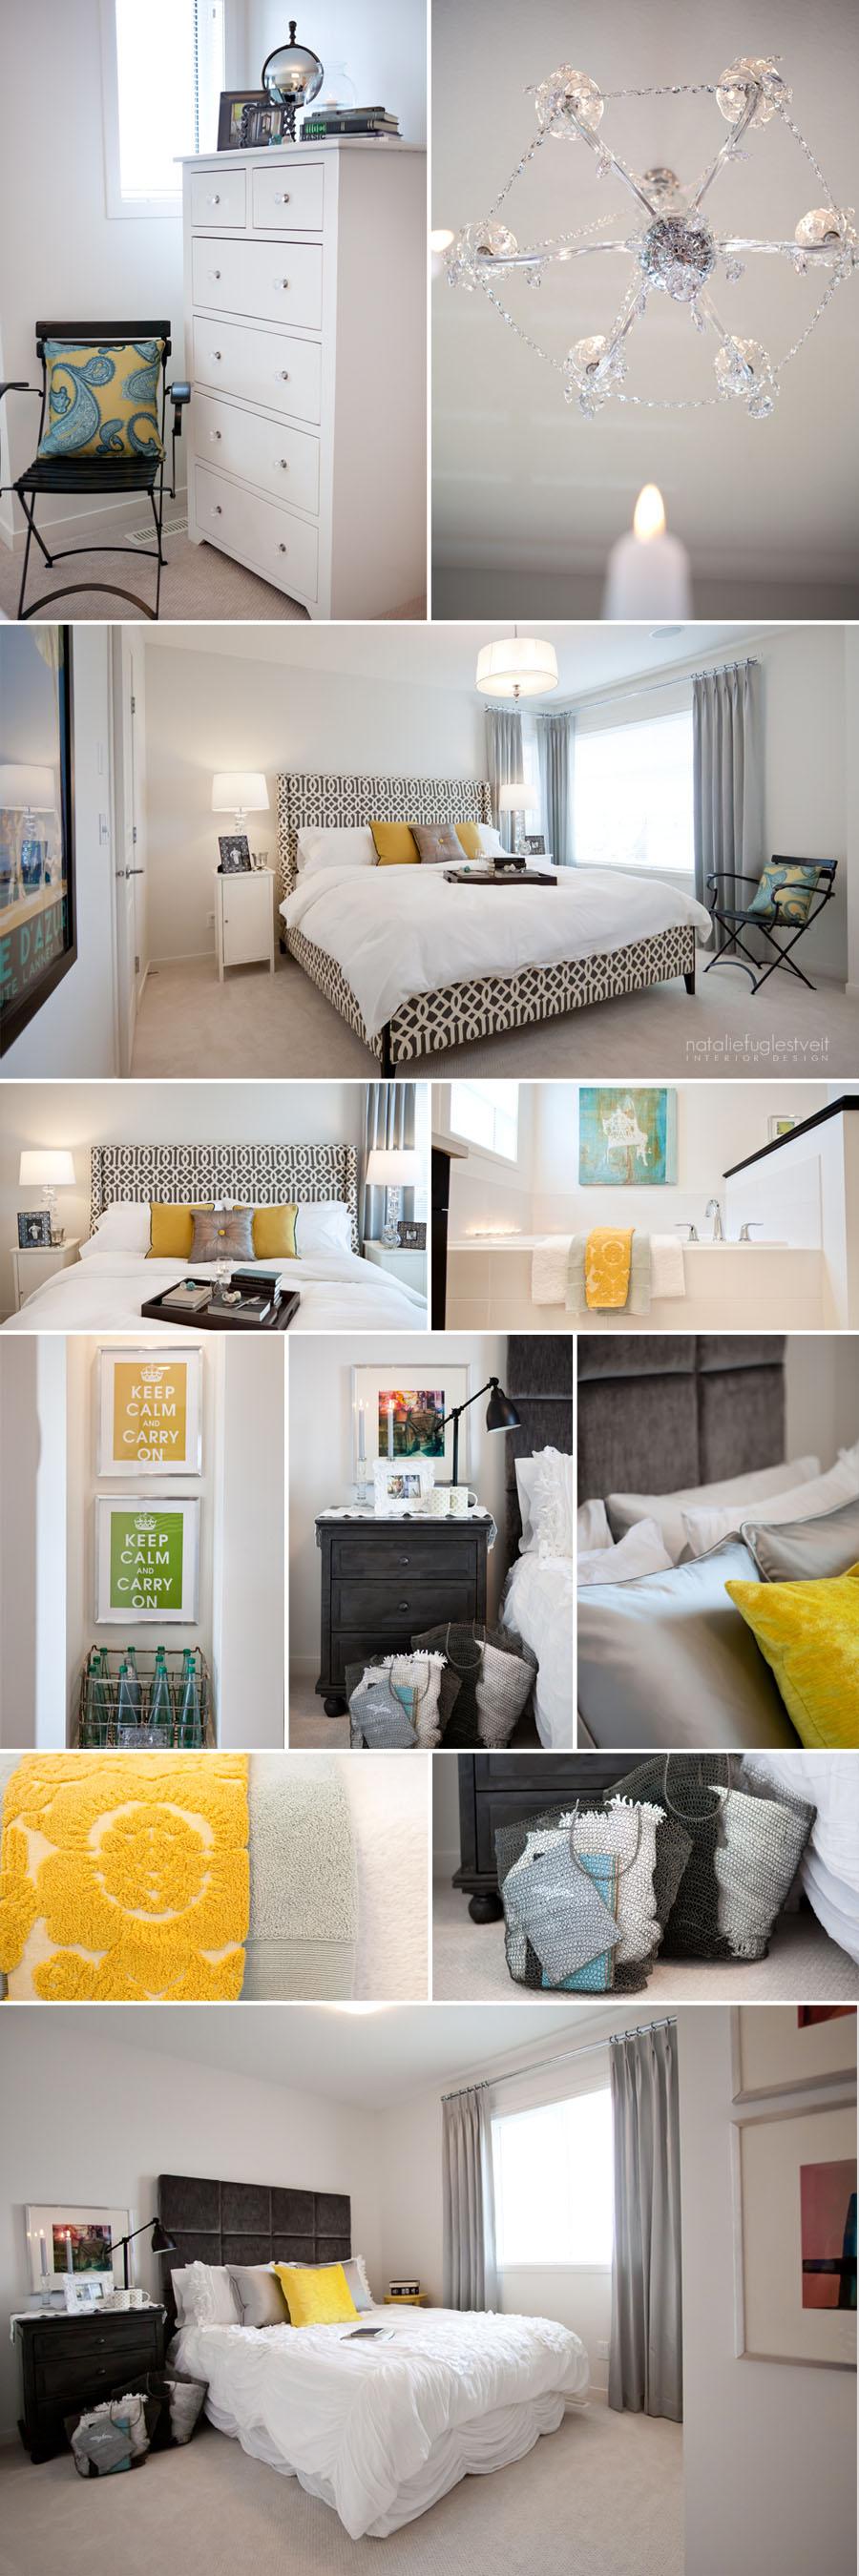 Charming Abode by Calgary Interior Designer